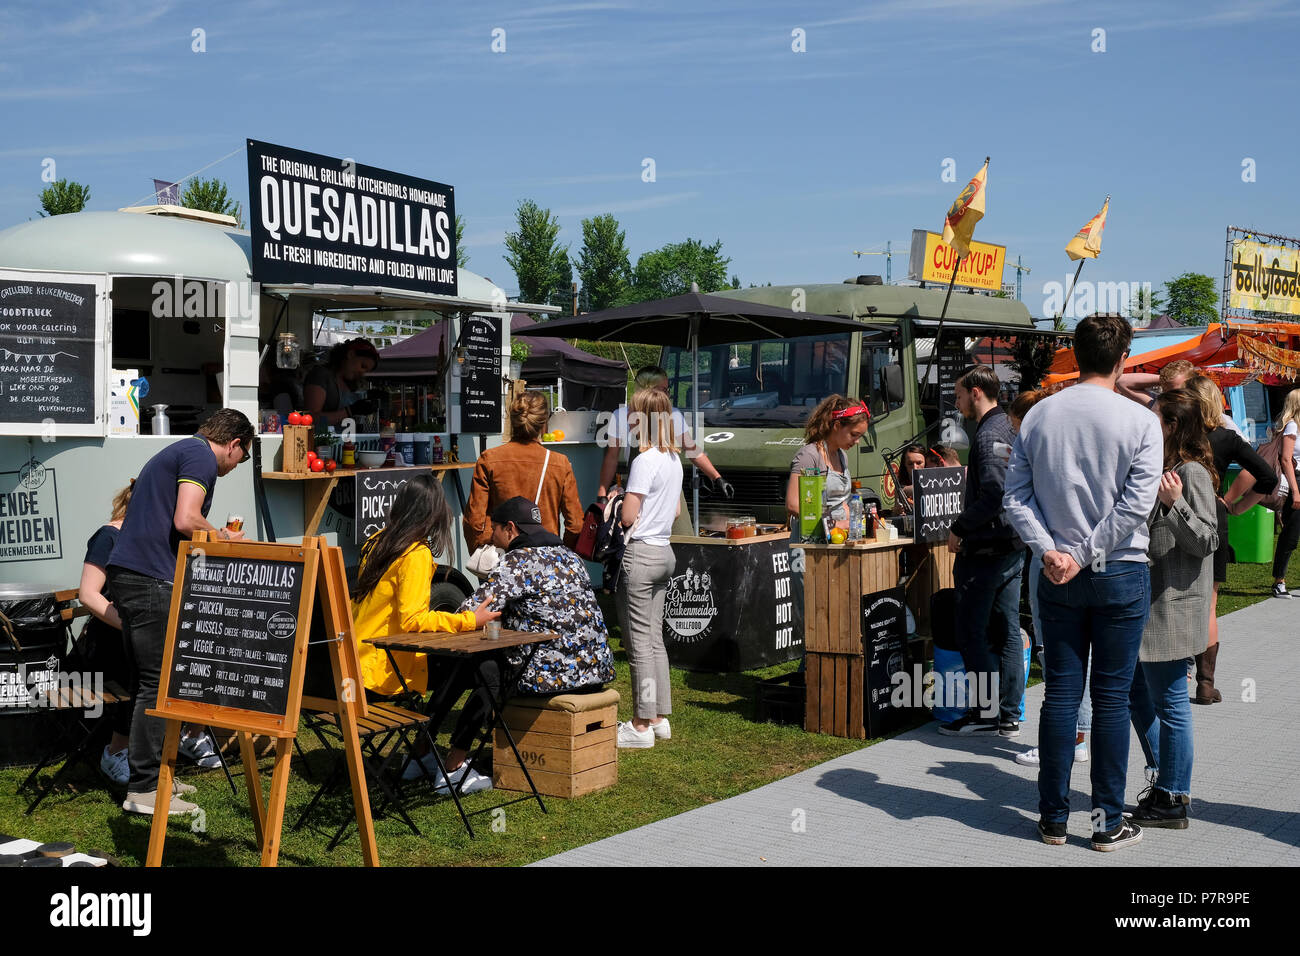 Rollende Keukens Amsterdam : Food festival de rollende keukens the rolling kitchens in